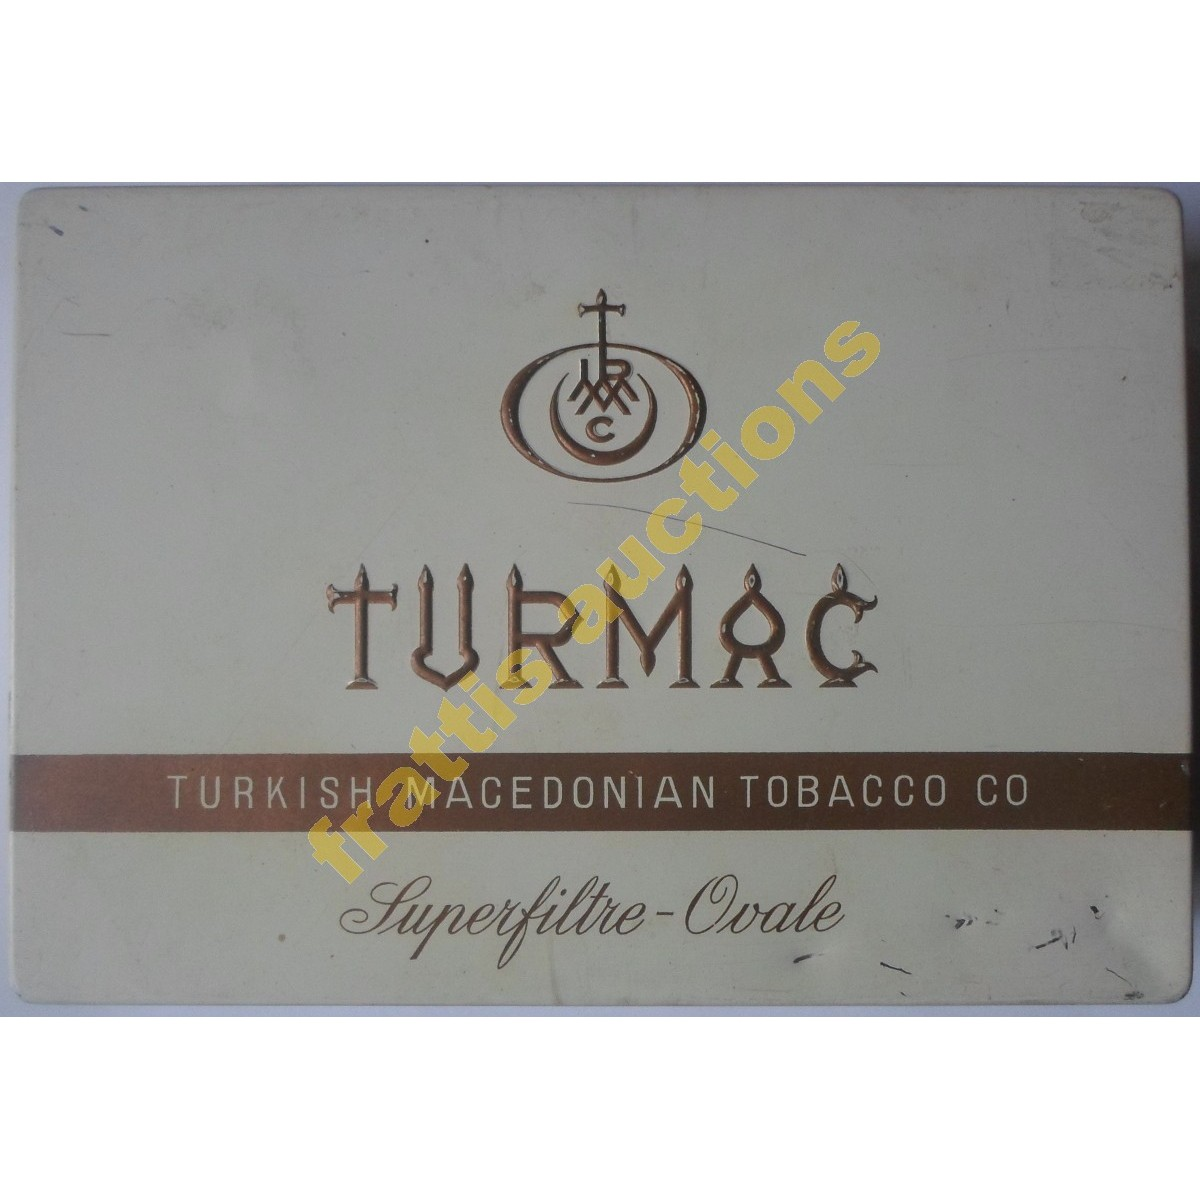 TURMAC Turkish Macedonian Tobacco Co, παλιό μεταλλικό κουτί των 100 τσιγάρων φίλτρου.